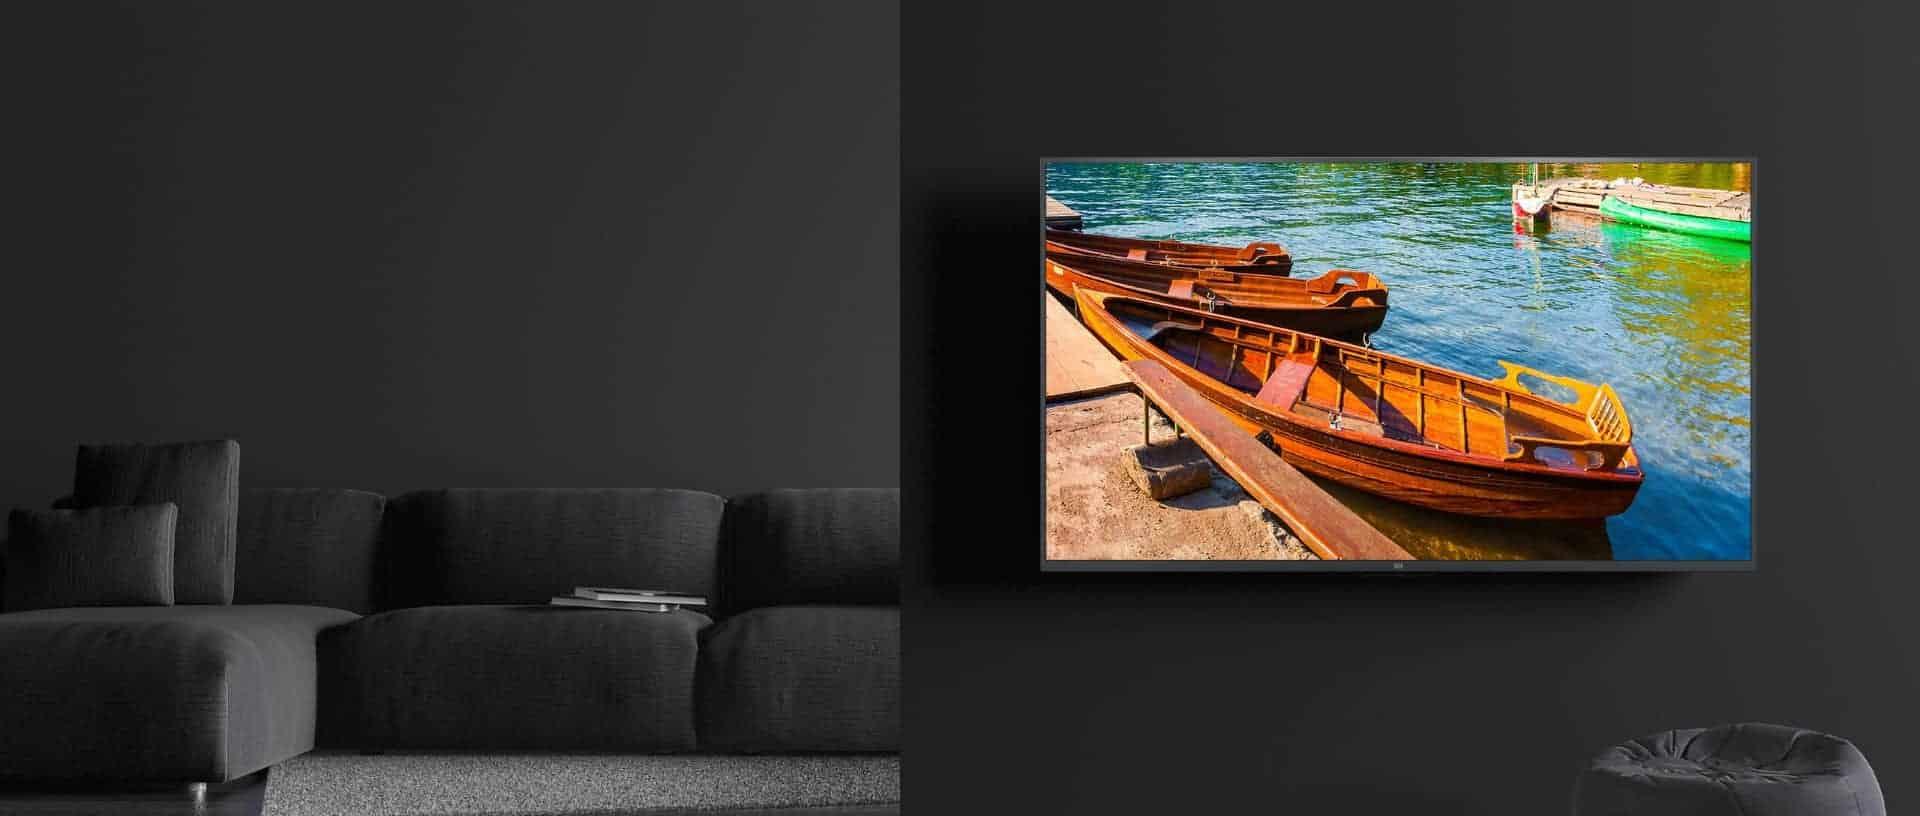 Xiaomi Mi TV 4S 55 inch image 2